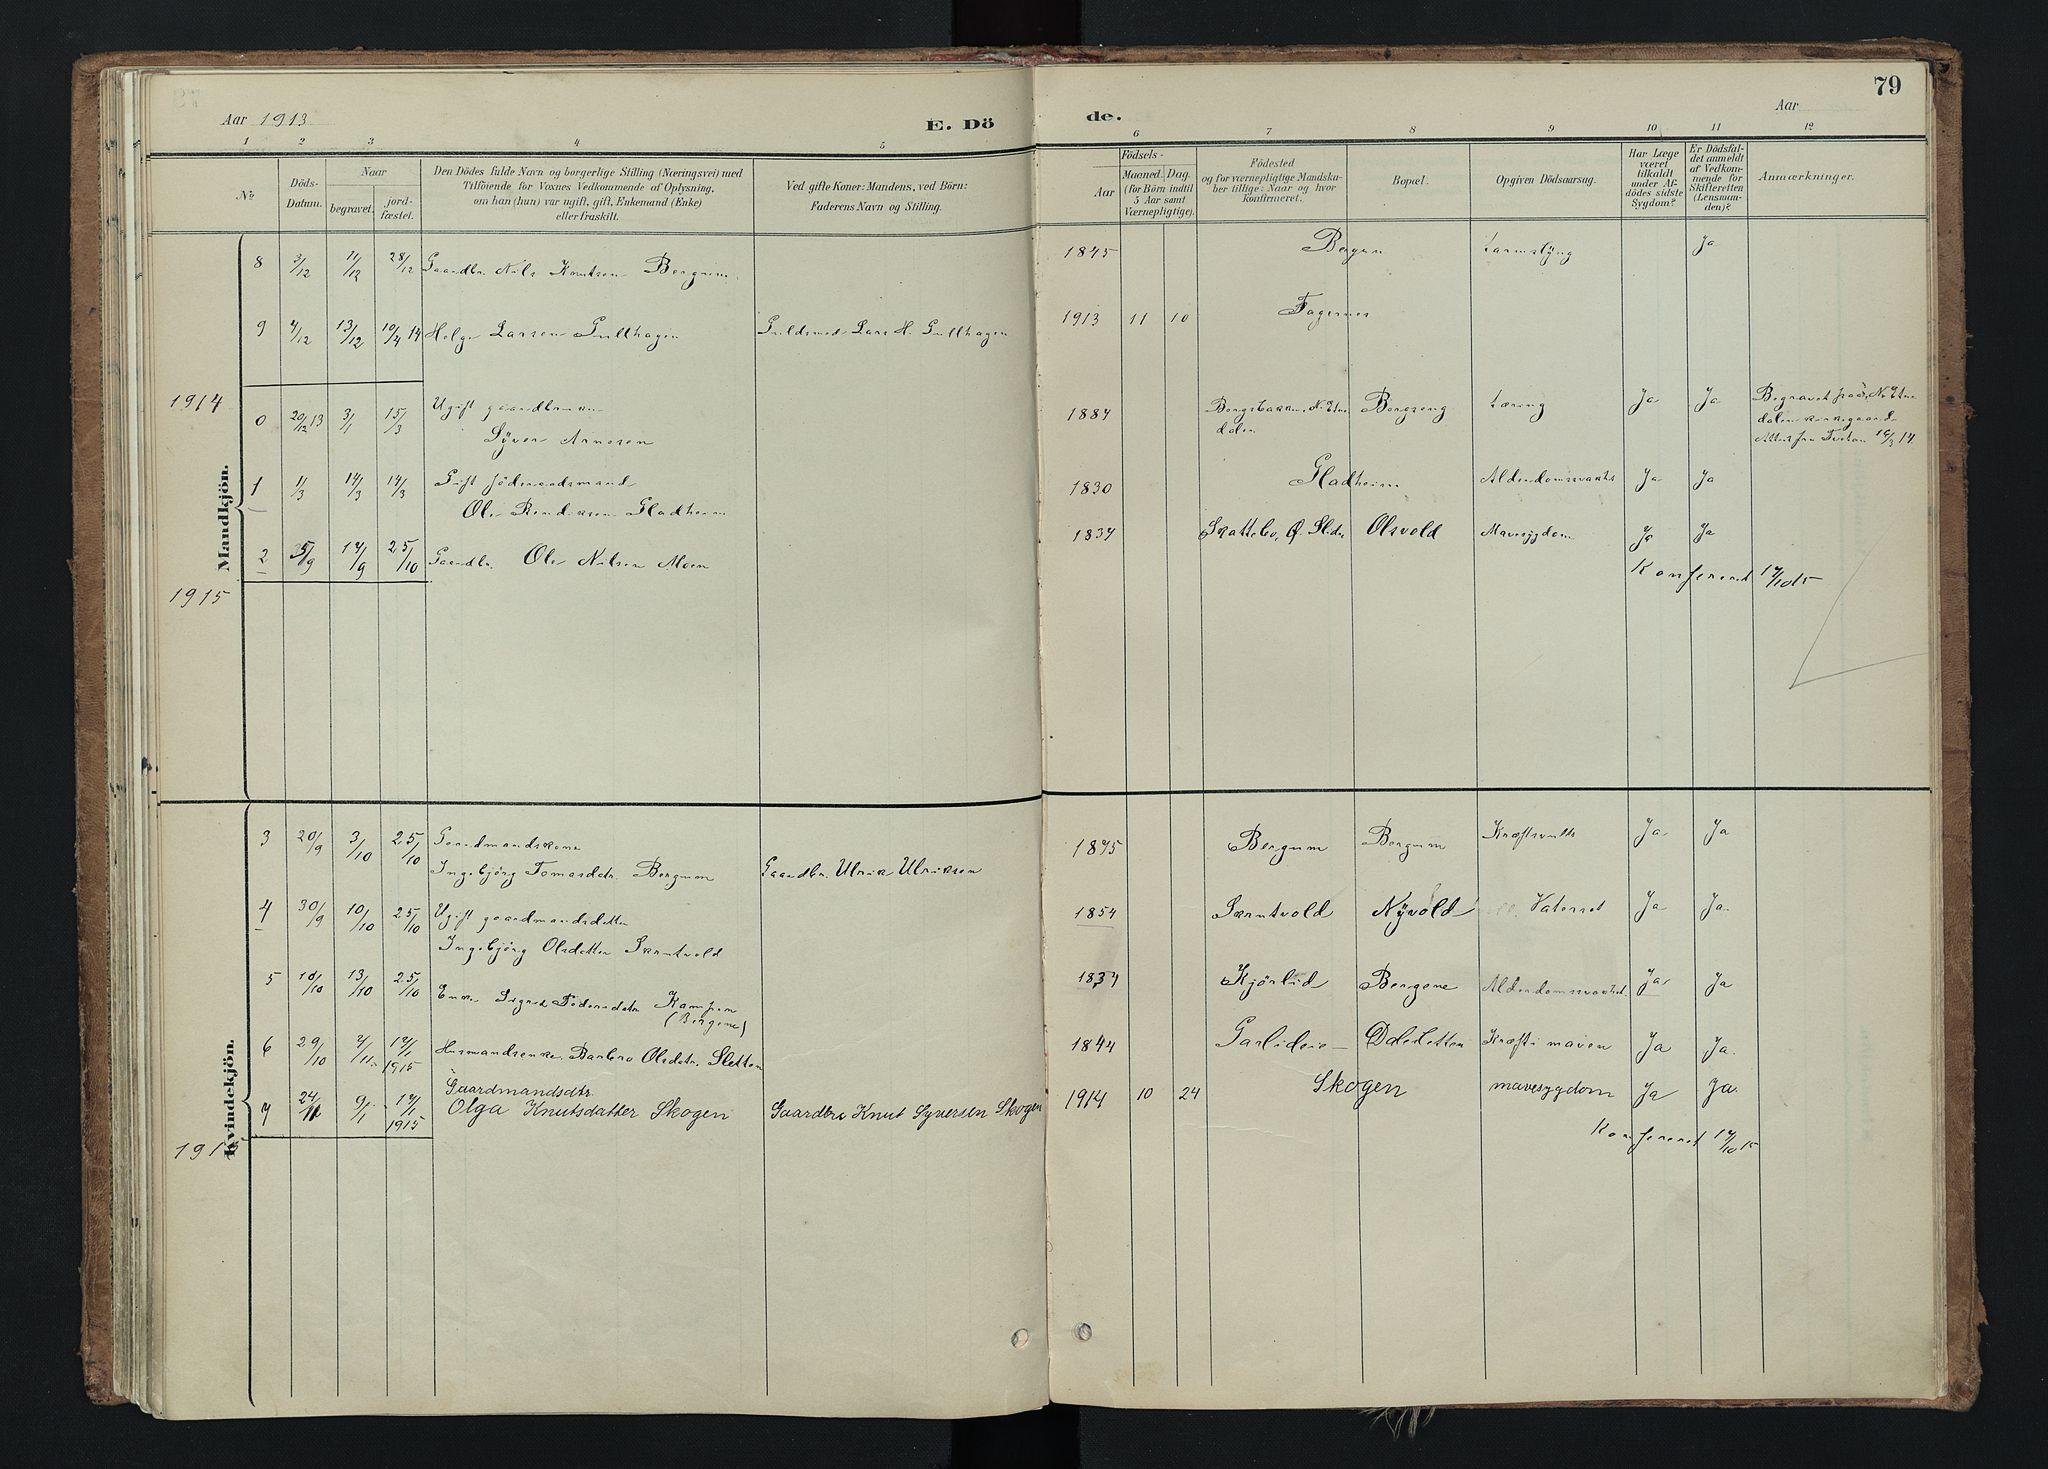 SAH, Nord-Aurdal prestekontor, Ministerialbok nr. 15, 1896-1914, s. 79